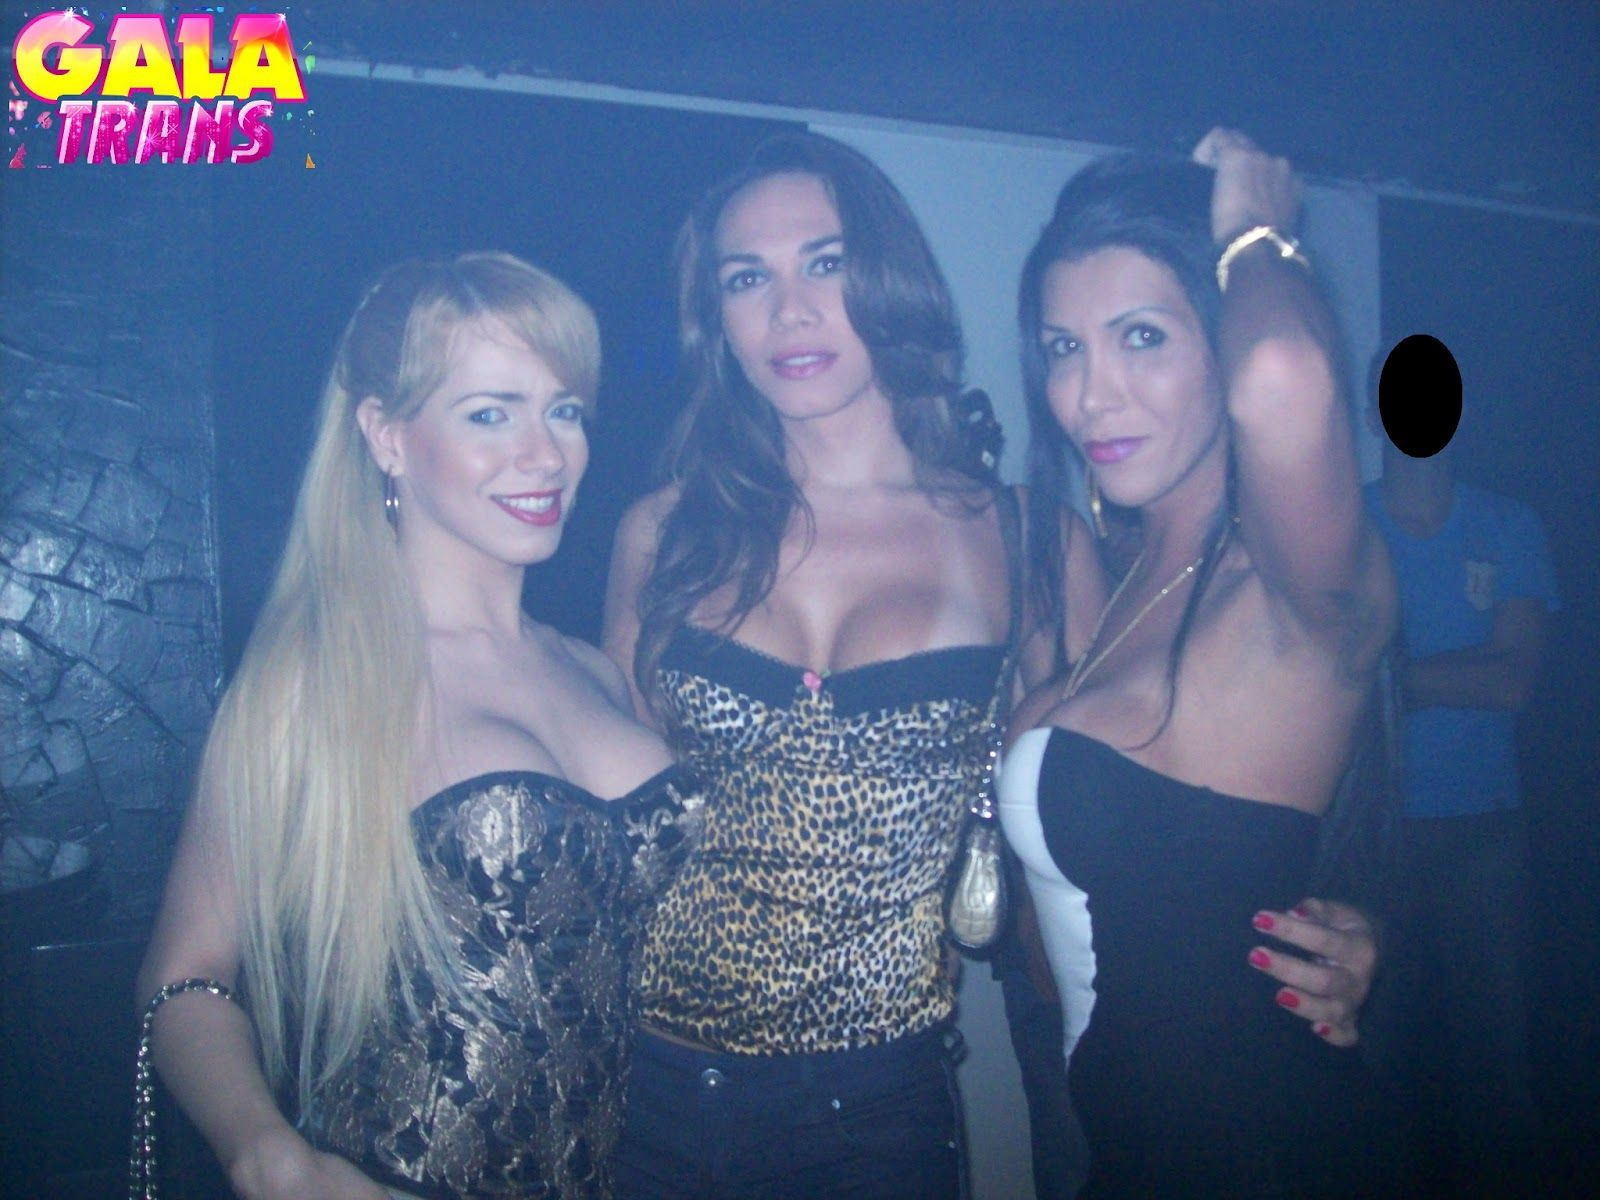 Shemale club in downtown la